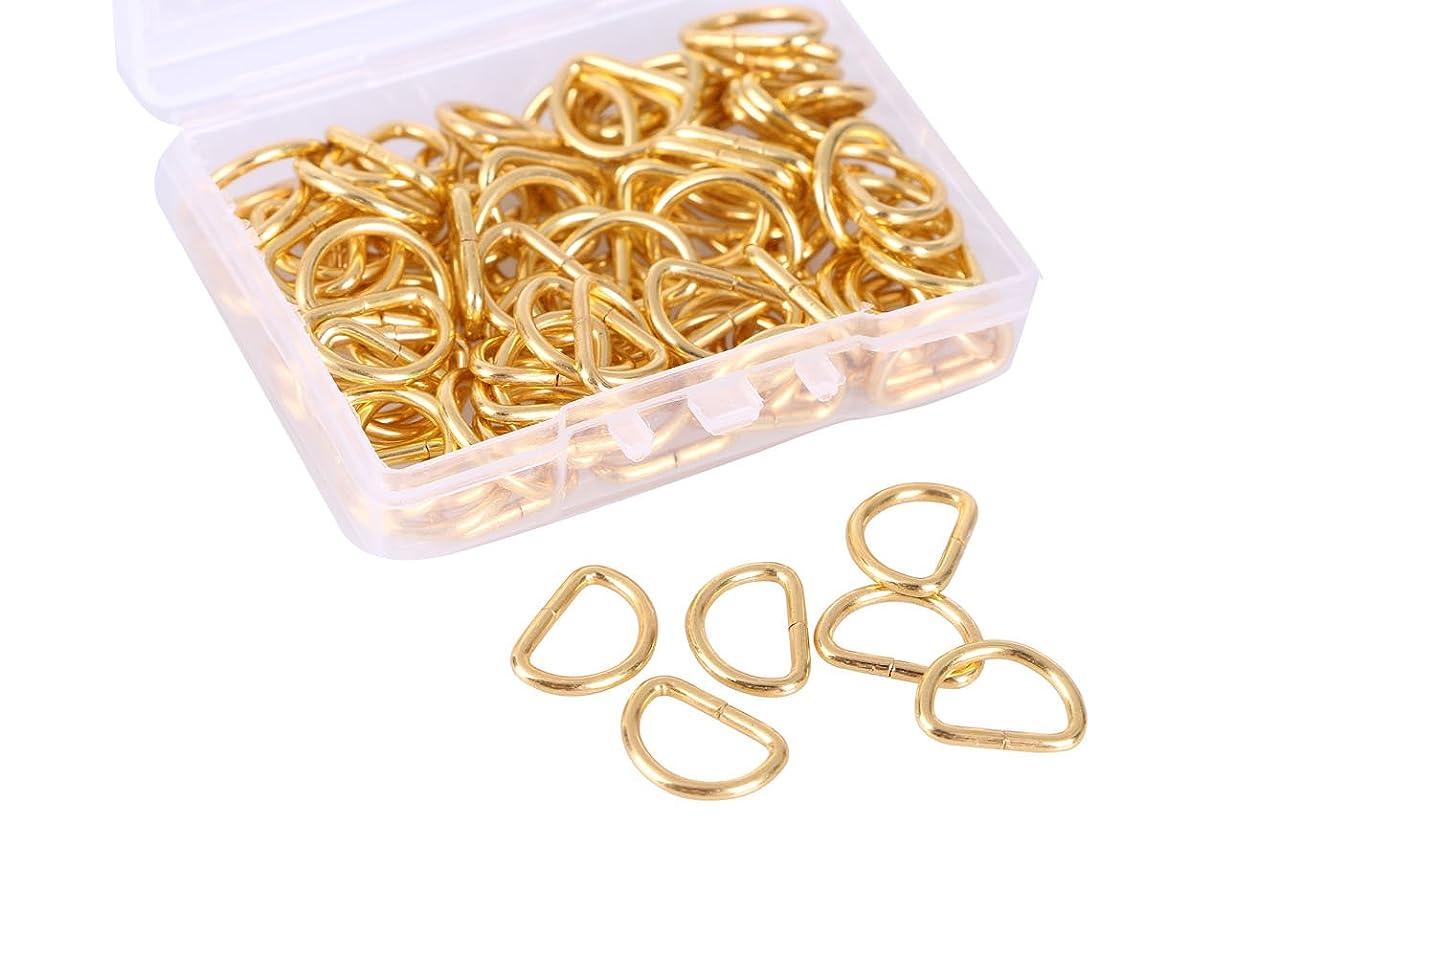 Mini Skater 100PCS Metal D Ring Non Welded Nickel Plated for Handbag Purse (Golden 0.39